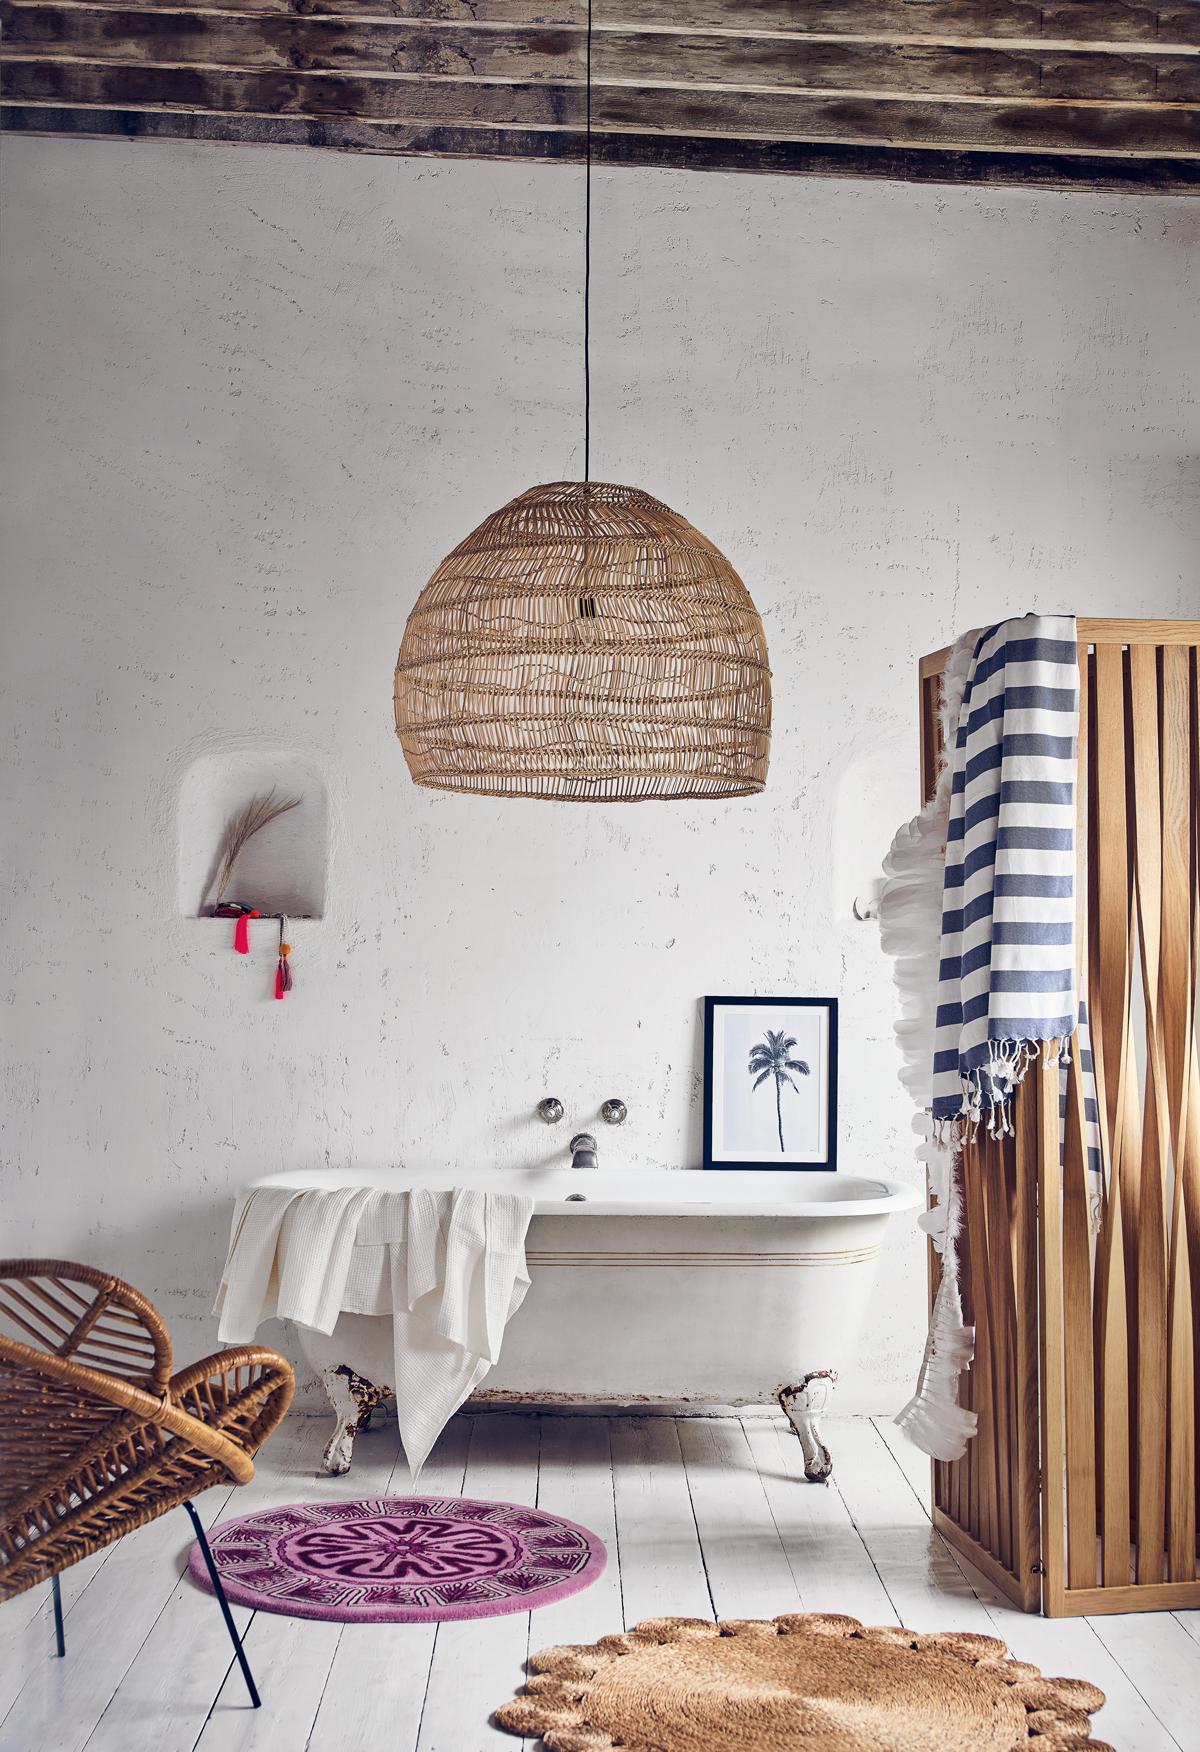 hanging chair notonthehighstreet patio swing interior design trend 2018 modern ibiza coachella festival boho vibes petal bamboo 1 187 chelsea textiles gwelsen oak screen 695 tom raffield wicker lamp 415 out there interiors